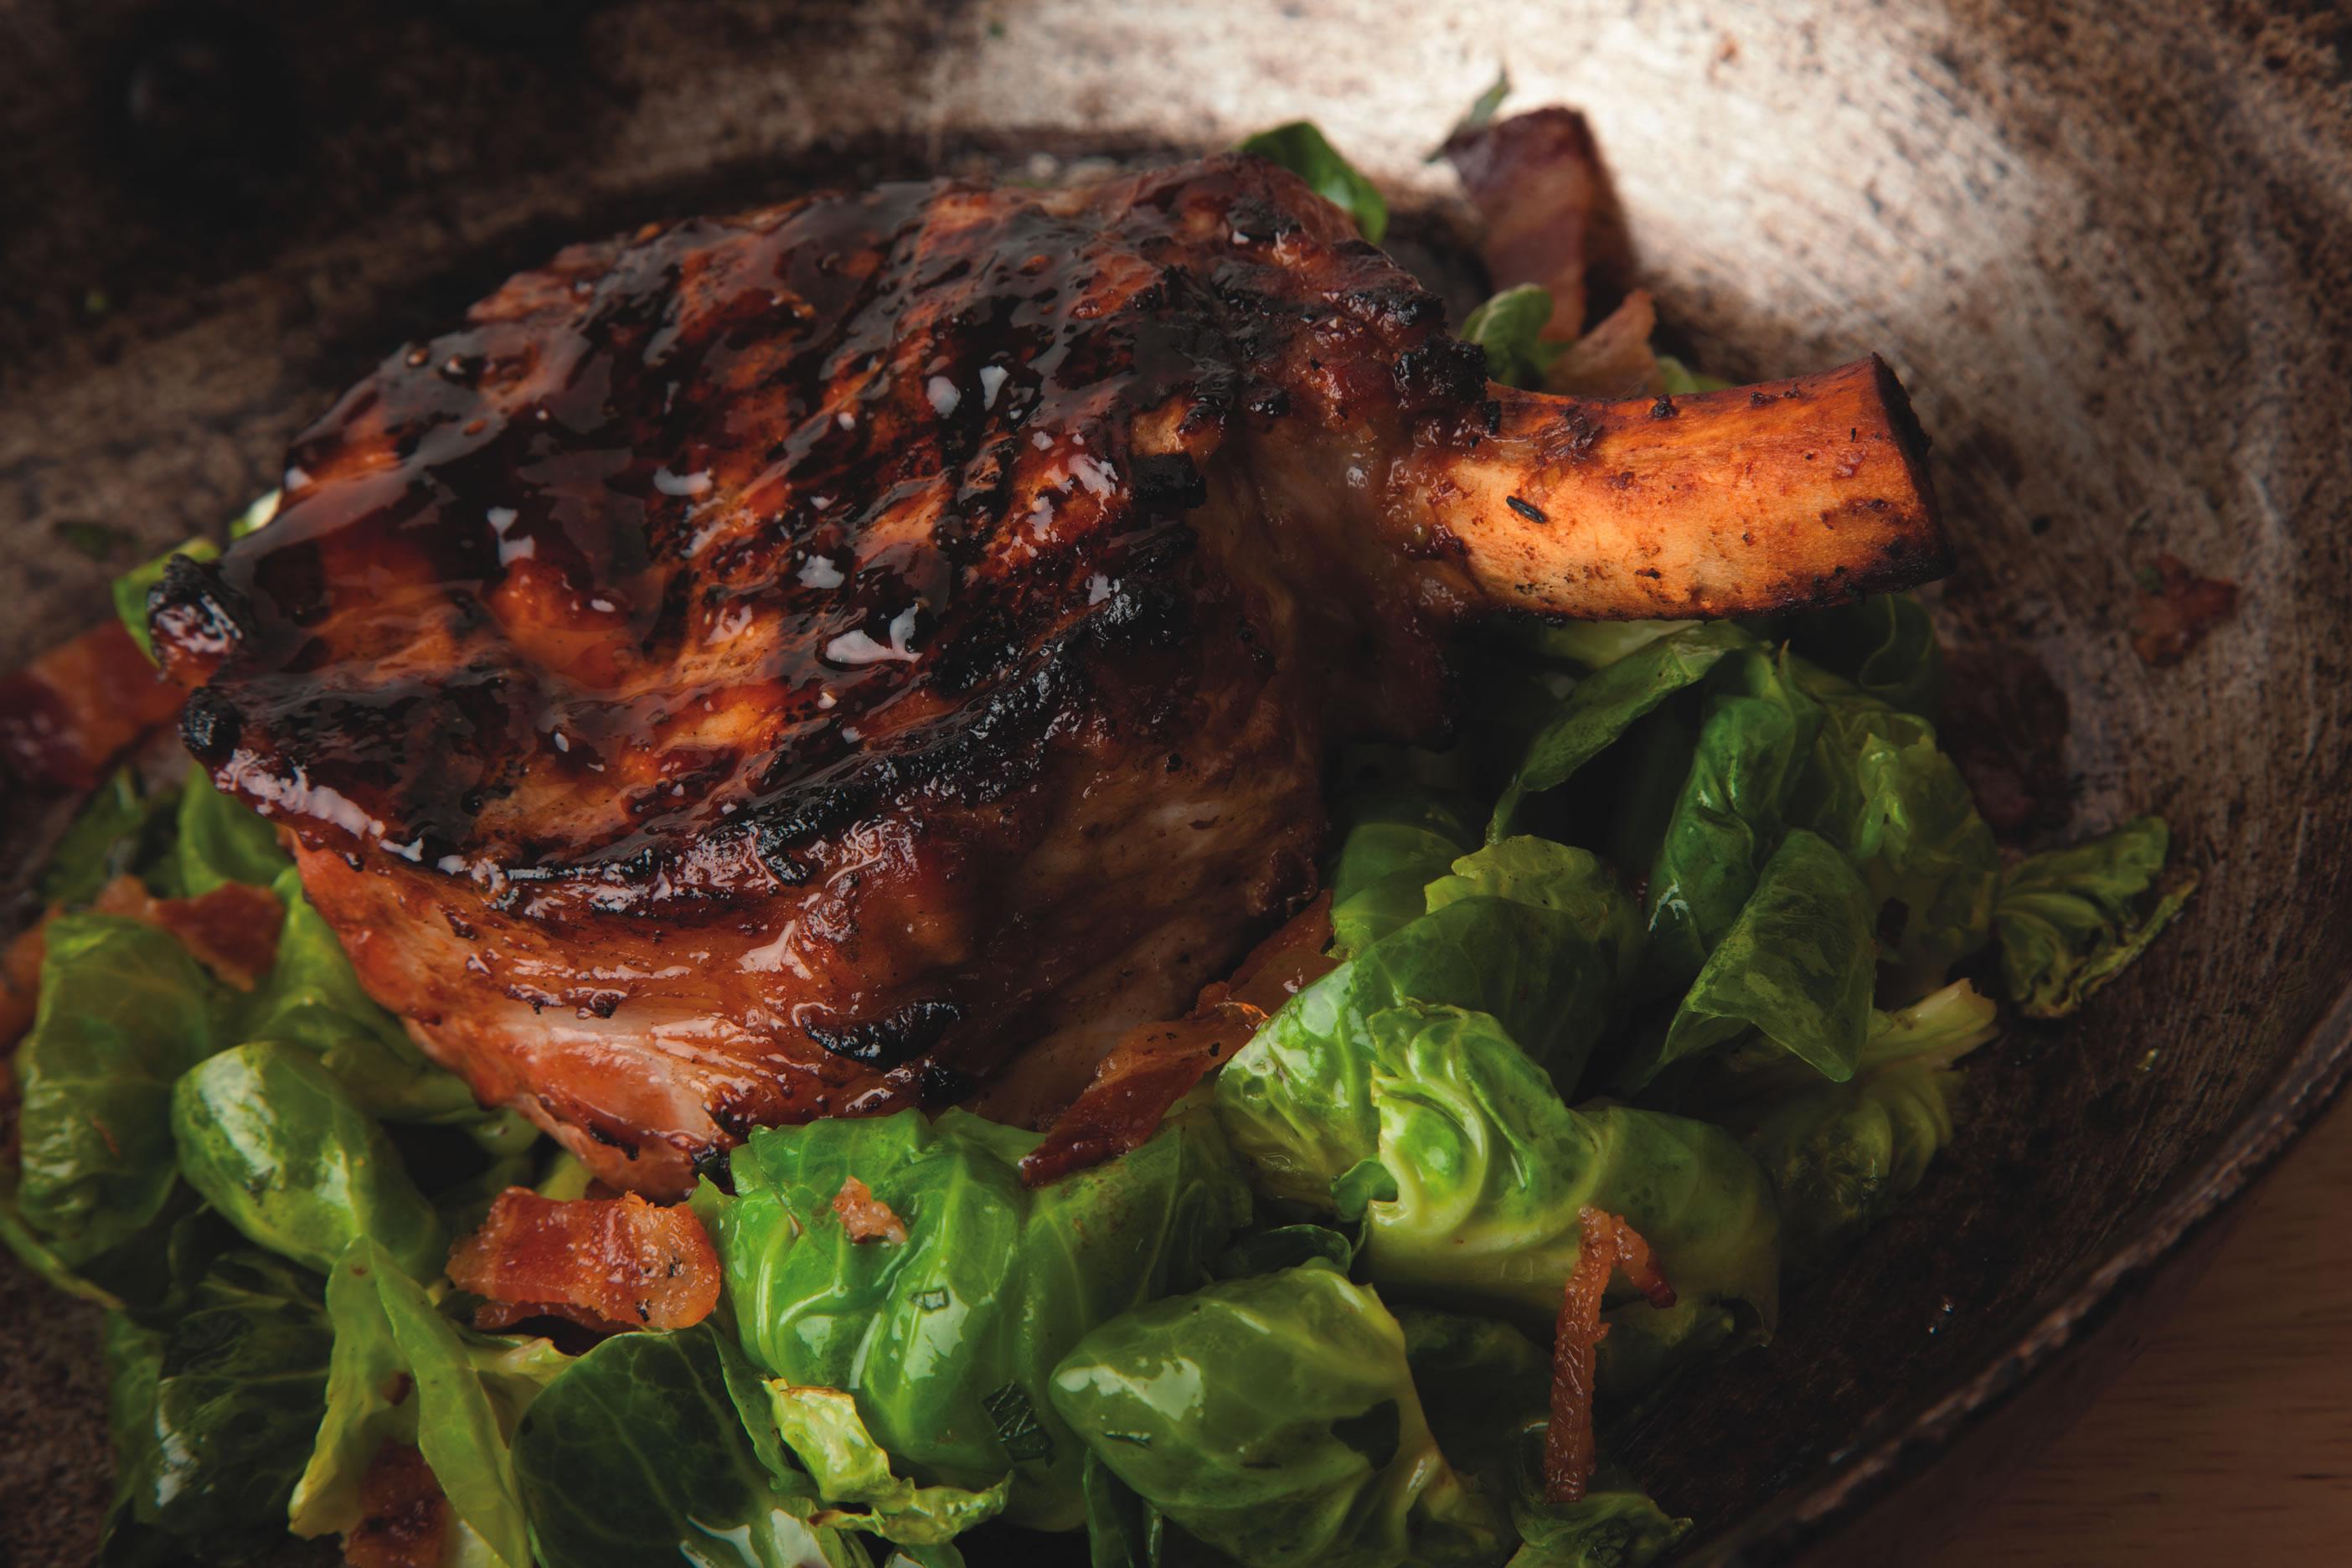 Hoisin-marinated pork chop at Paul Martin's American Grill